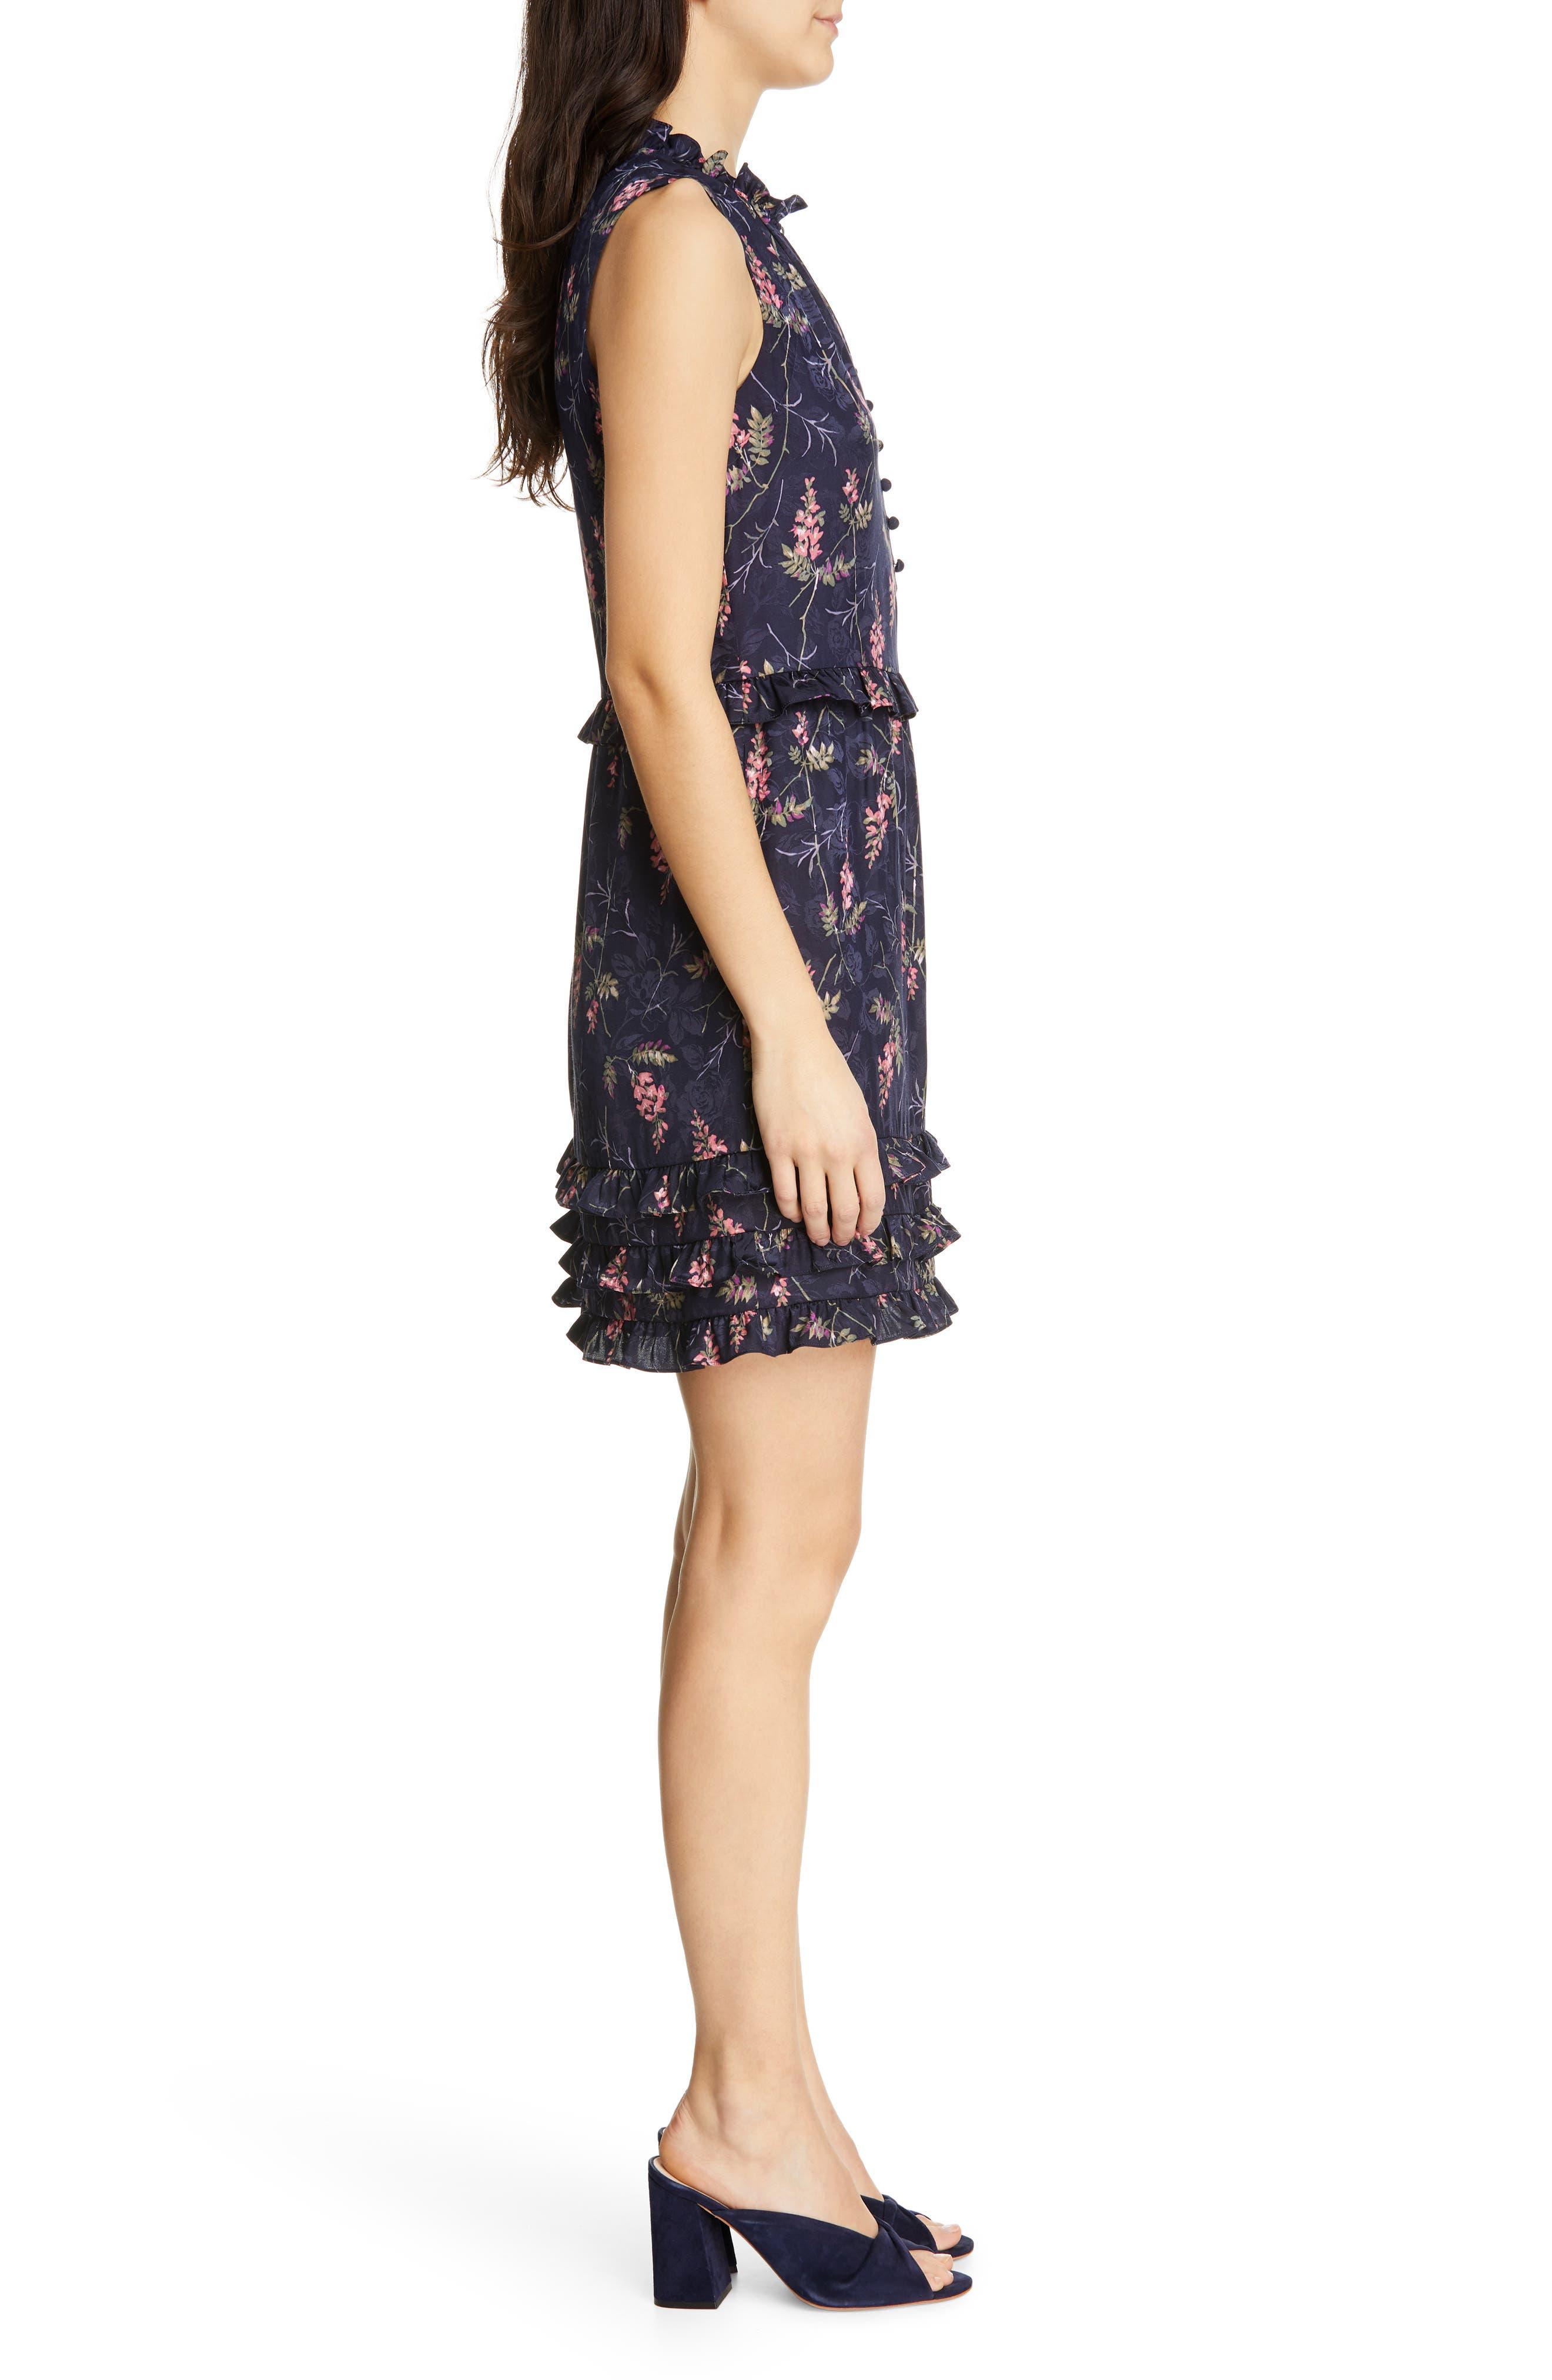 REBECCA TAYLOR, Ivie Floral Ruffle Silk Blend Dress, Alternate thumbnail 3, color, NAVY COMBO